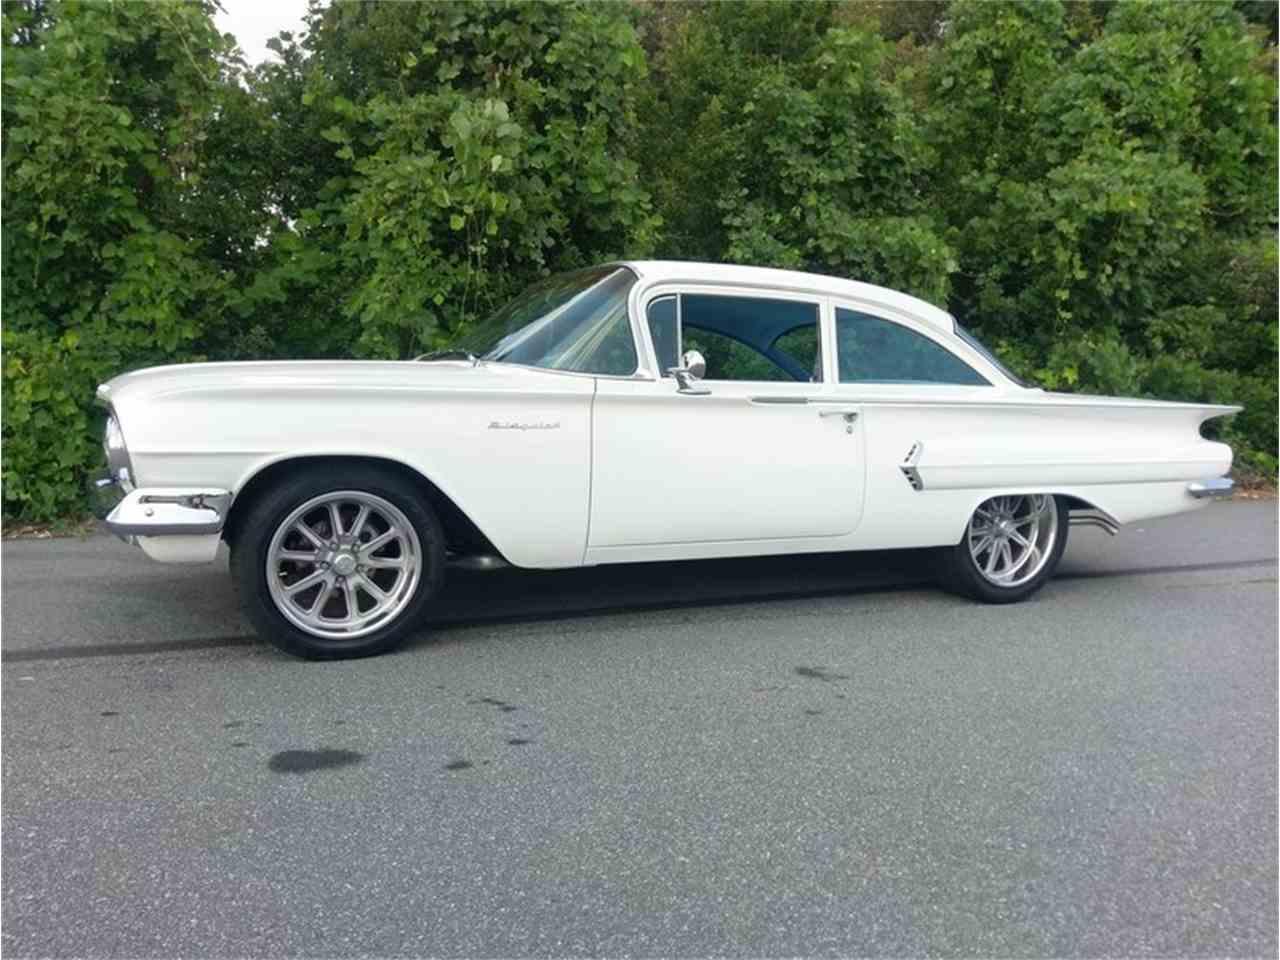 All Chevy 1960 chevrolet biscayne 2 door : 1960 Chevrolet Biscayne 2 Door Post for Sale | ClassicCars.com ...